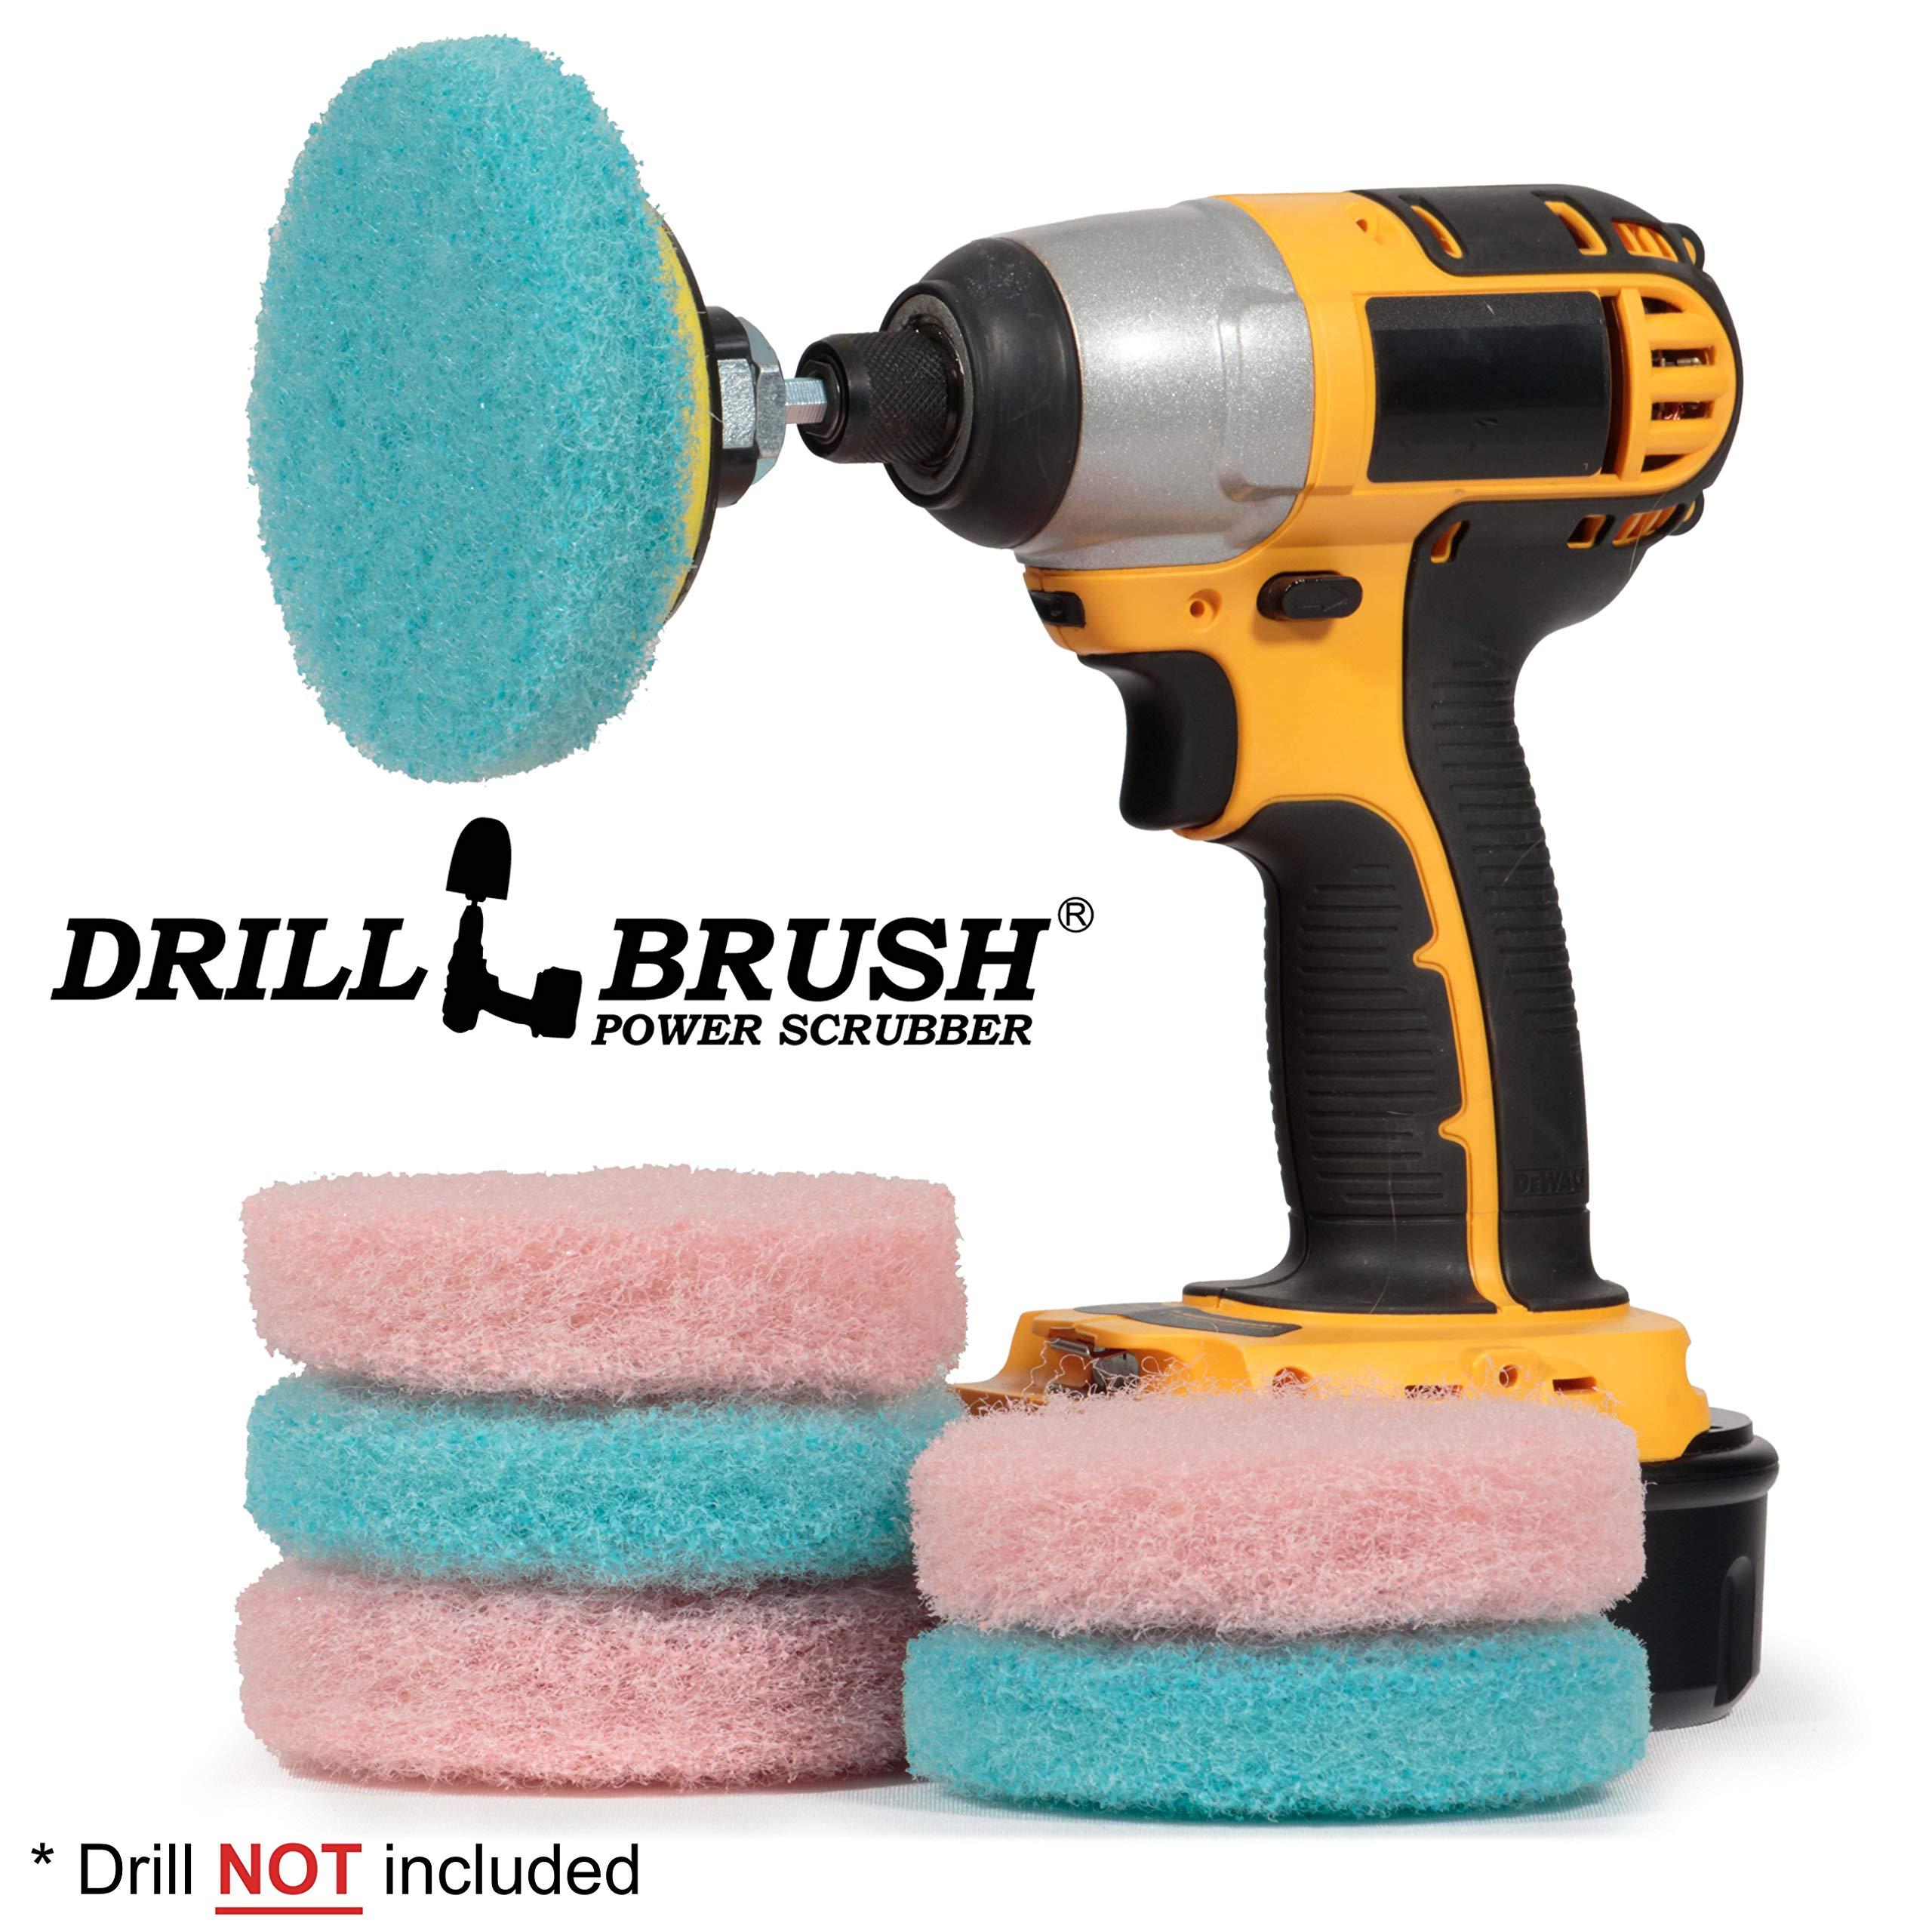 Drill Brush - Cleaning Supplies - Bathroom Accessories - Scrub Pads - Shower Cleaner - Bathtub - Bath Mat - Bathroom Sink - Scrubber - Hard Water Stain Remover - Glass Cleaner - Shower Door Cleaner by Drillbrush